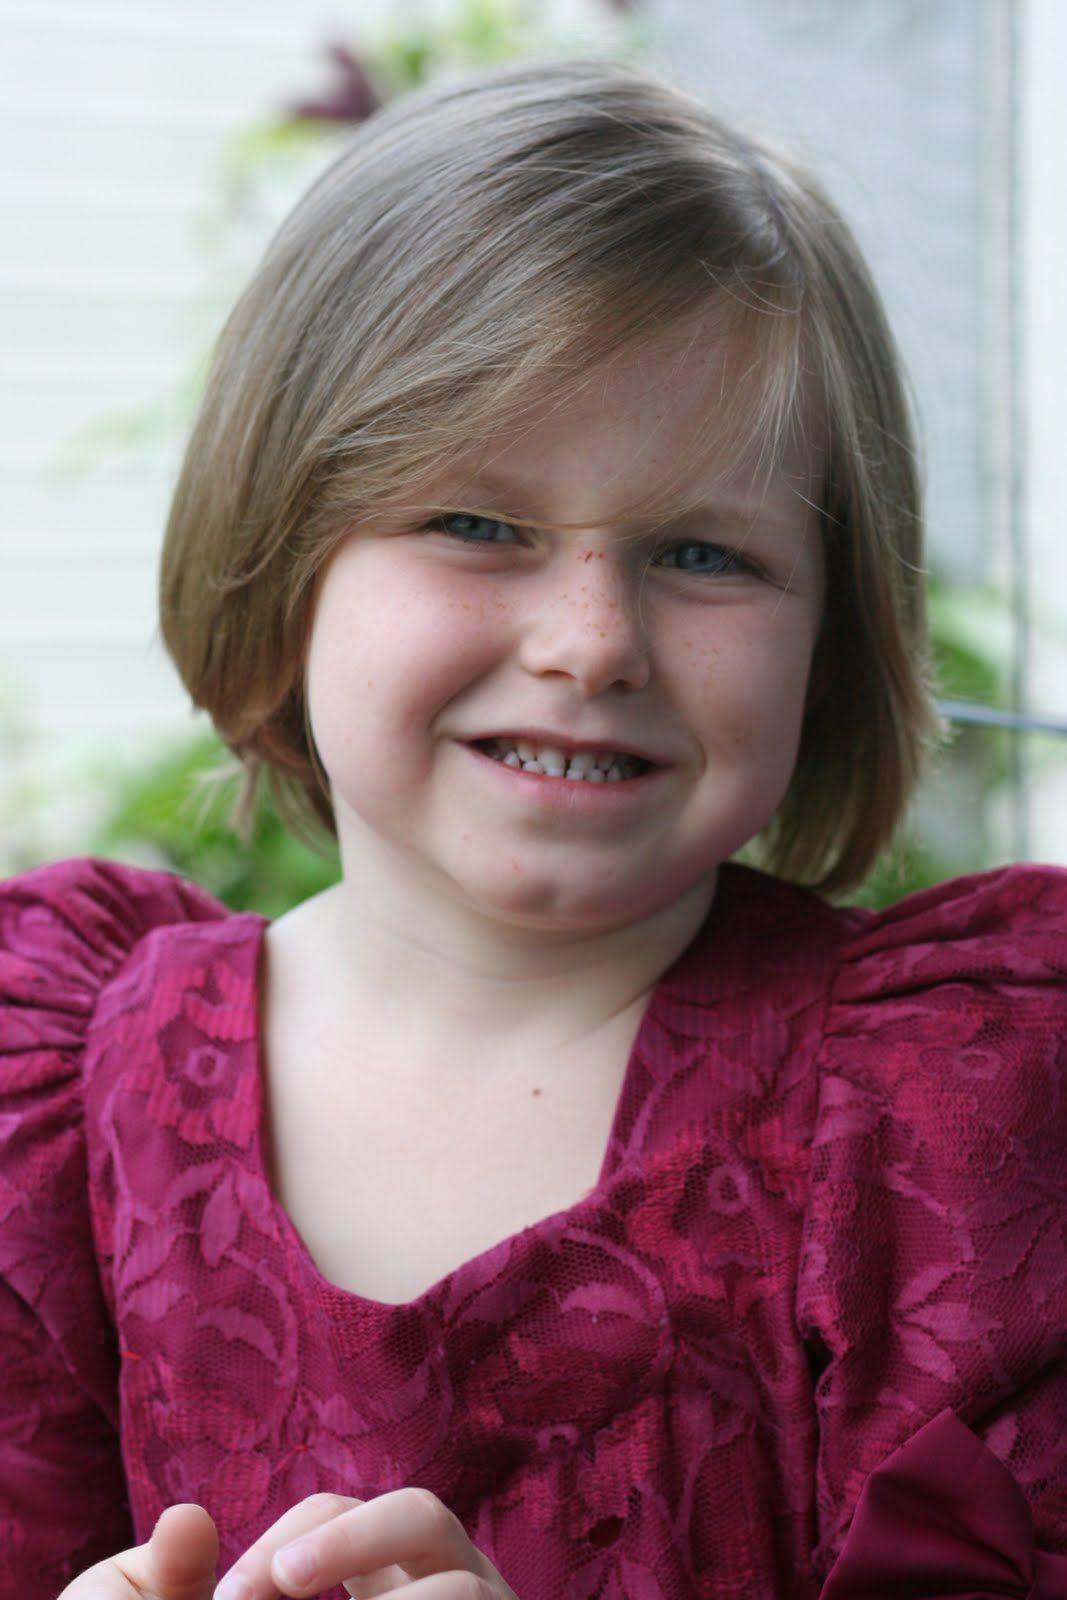 Frisuren 9 Jährige Mädchen Frisuren Pinterest Hair Styles